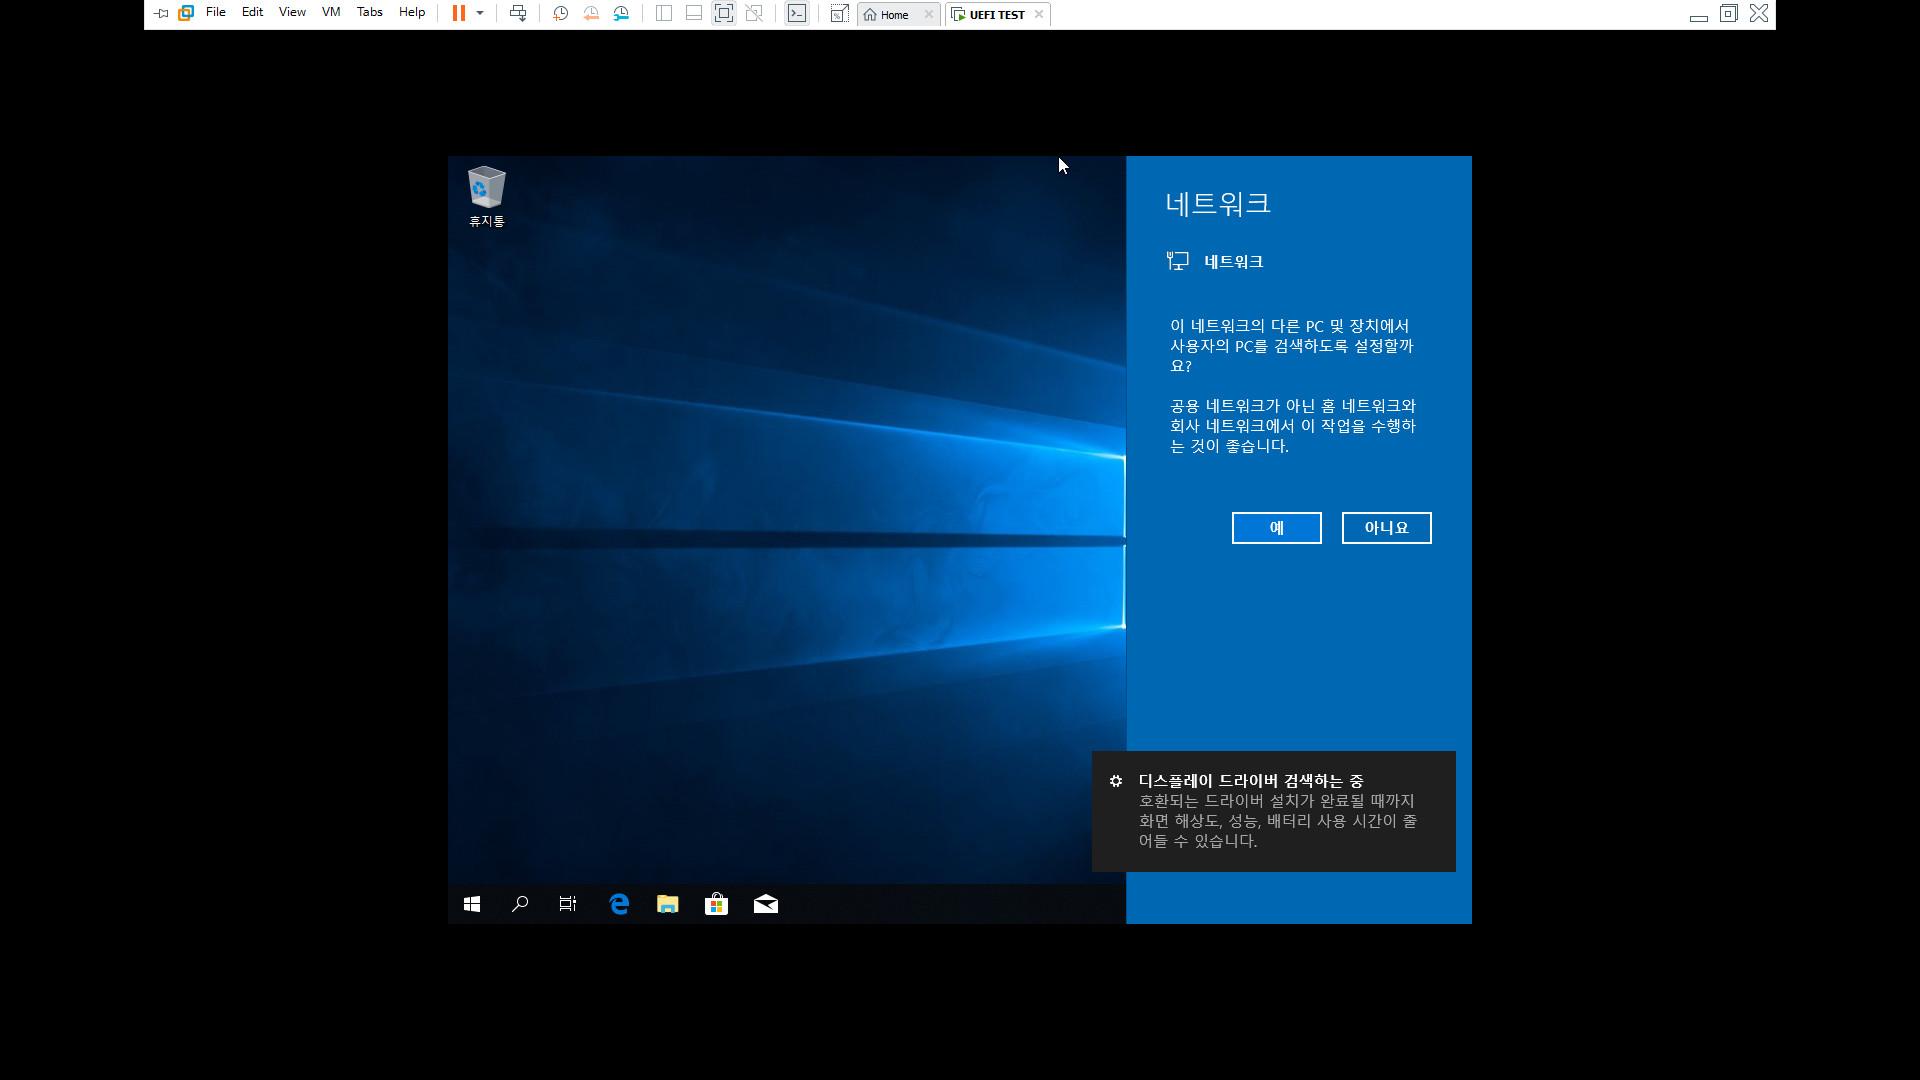 bootice.exe 으로 UEFI용 파티션 만들고 WinNTSetup.exe 으로 윈도 설치하기 예시 2019-03-15_224651.jpg